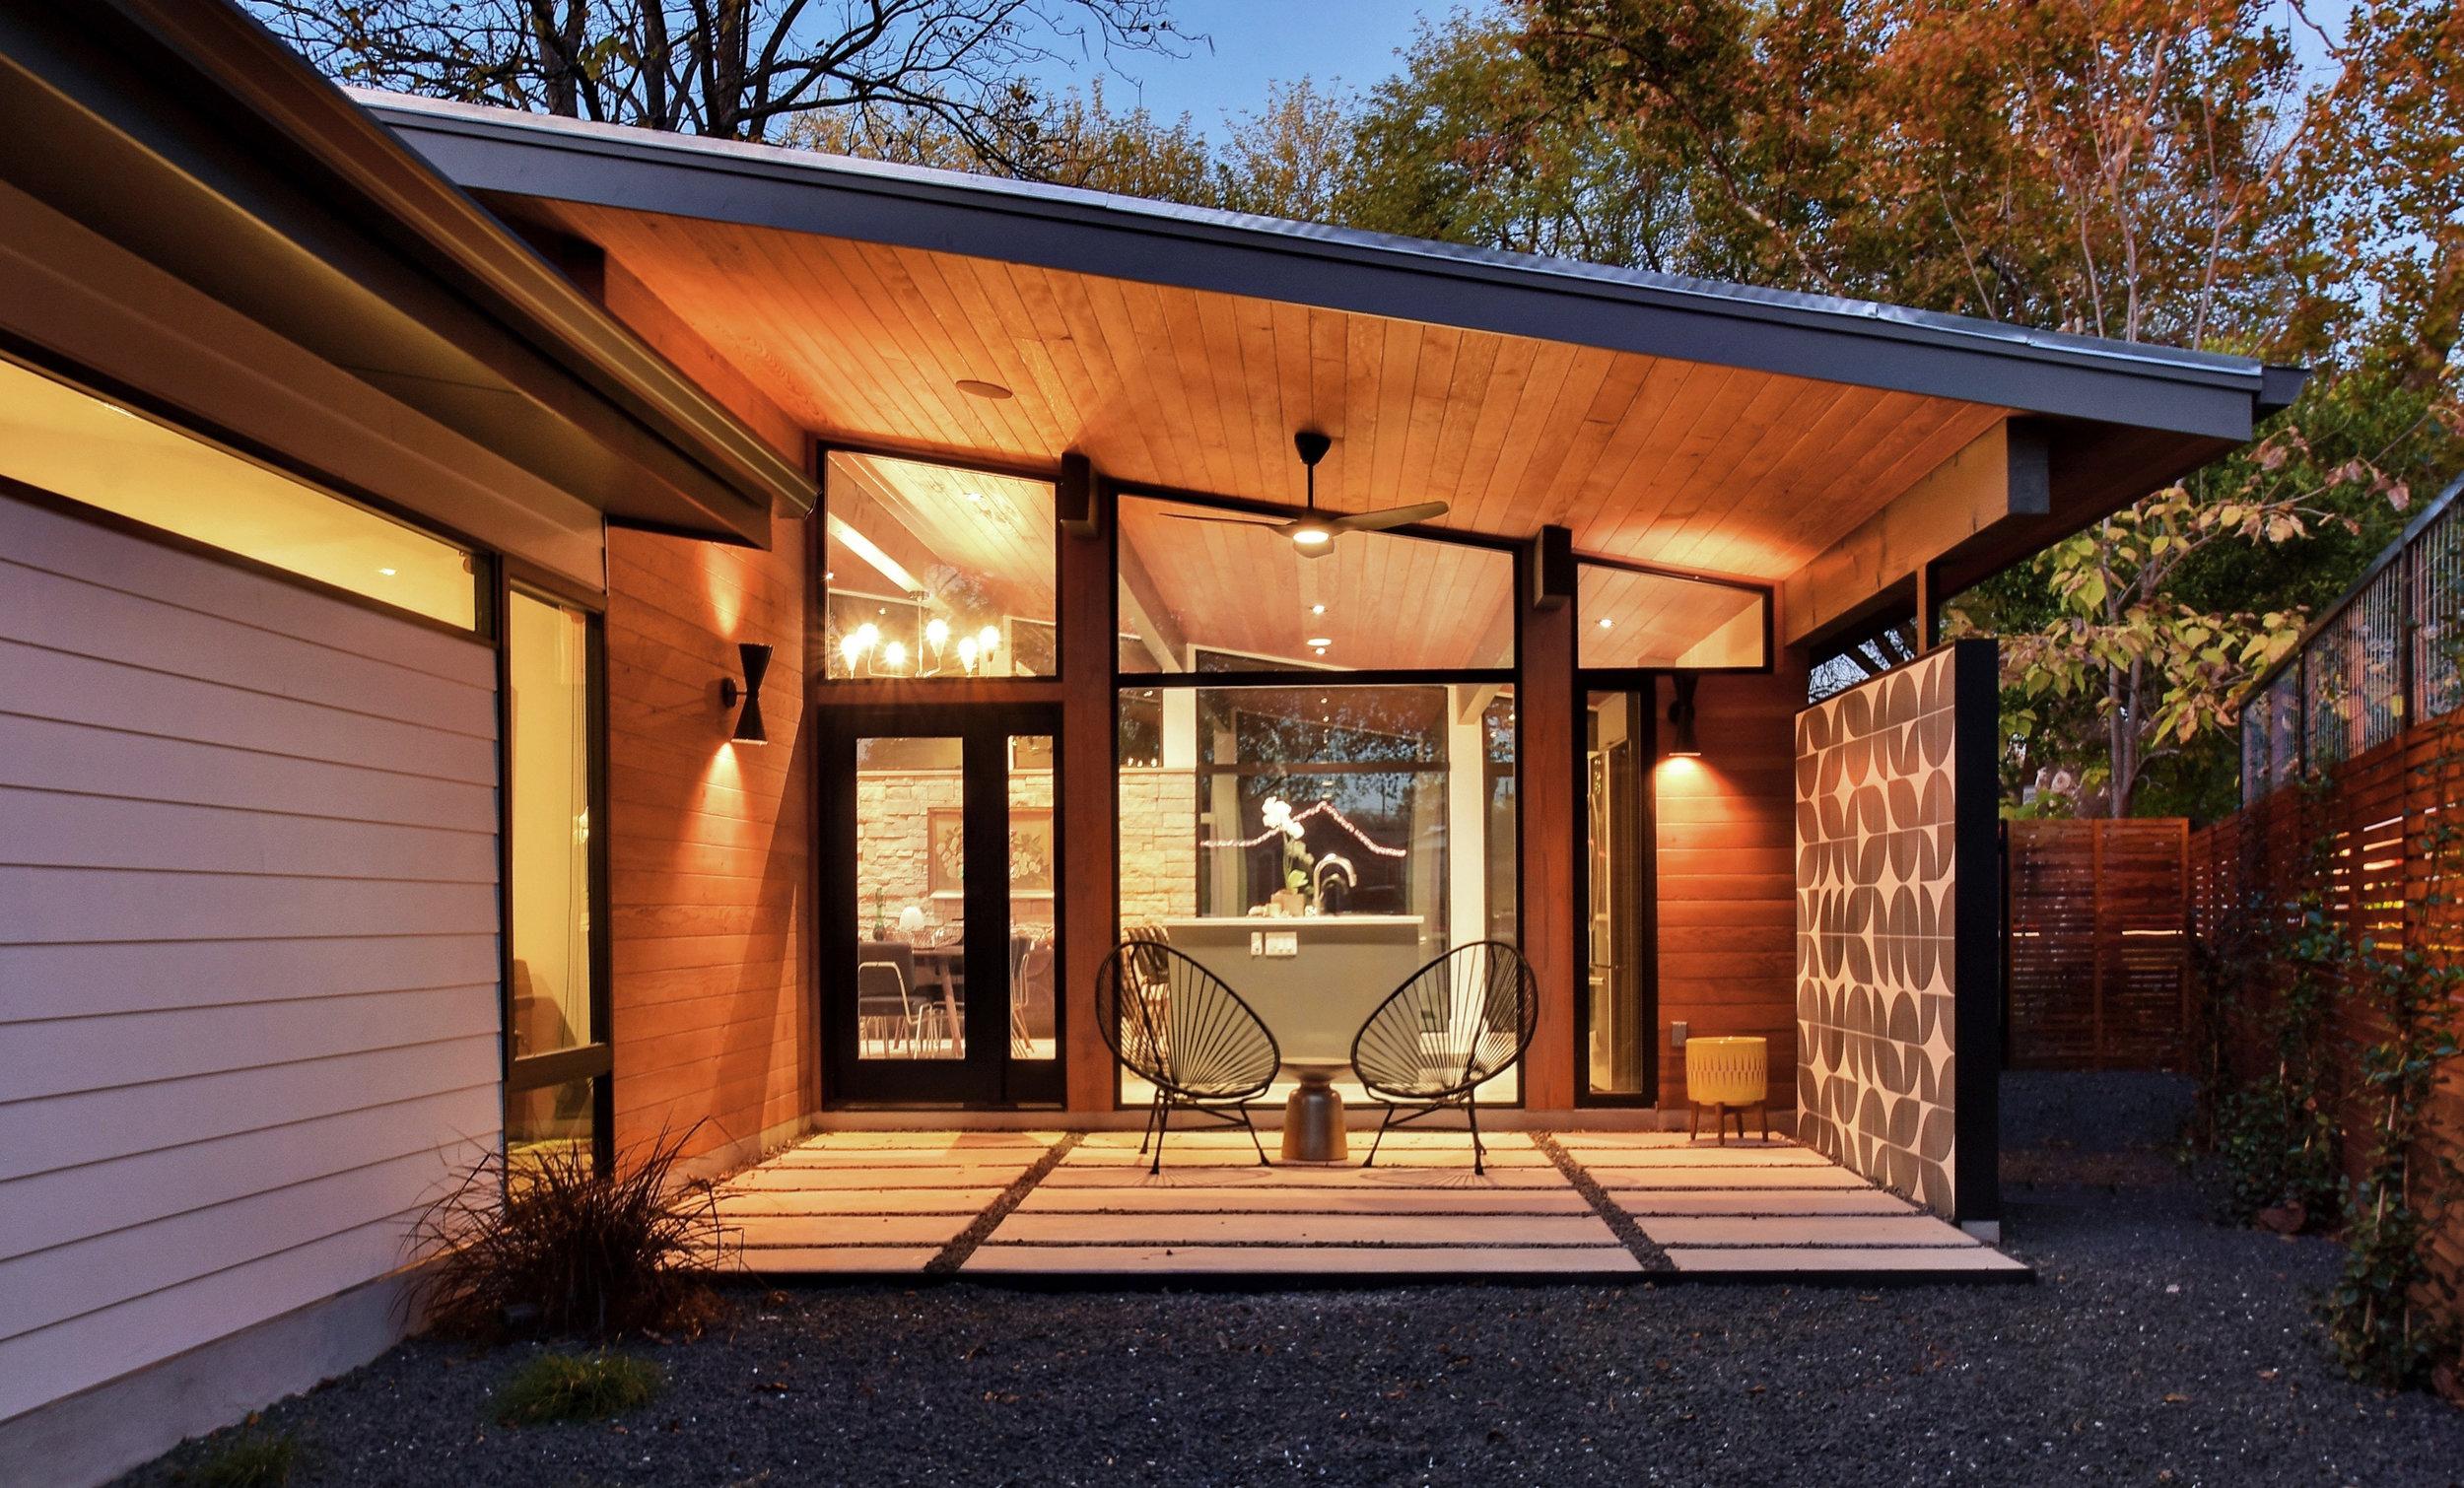 18 Re-Open House by Matt Fajkus Architecture - Photo by Charles Davis Smith.jpg